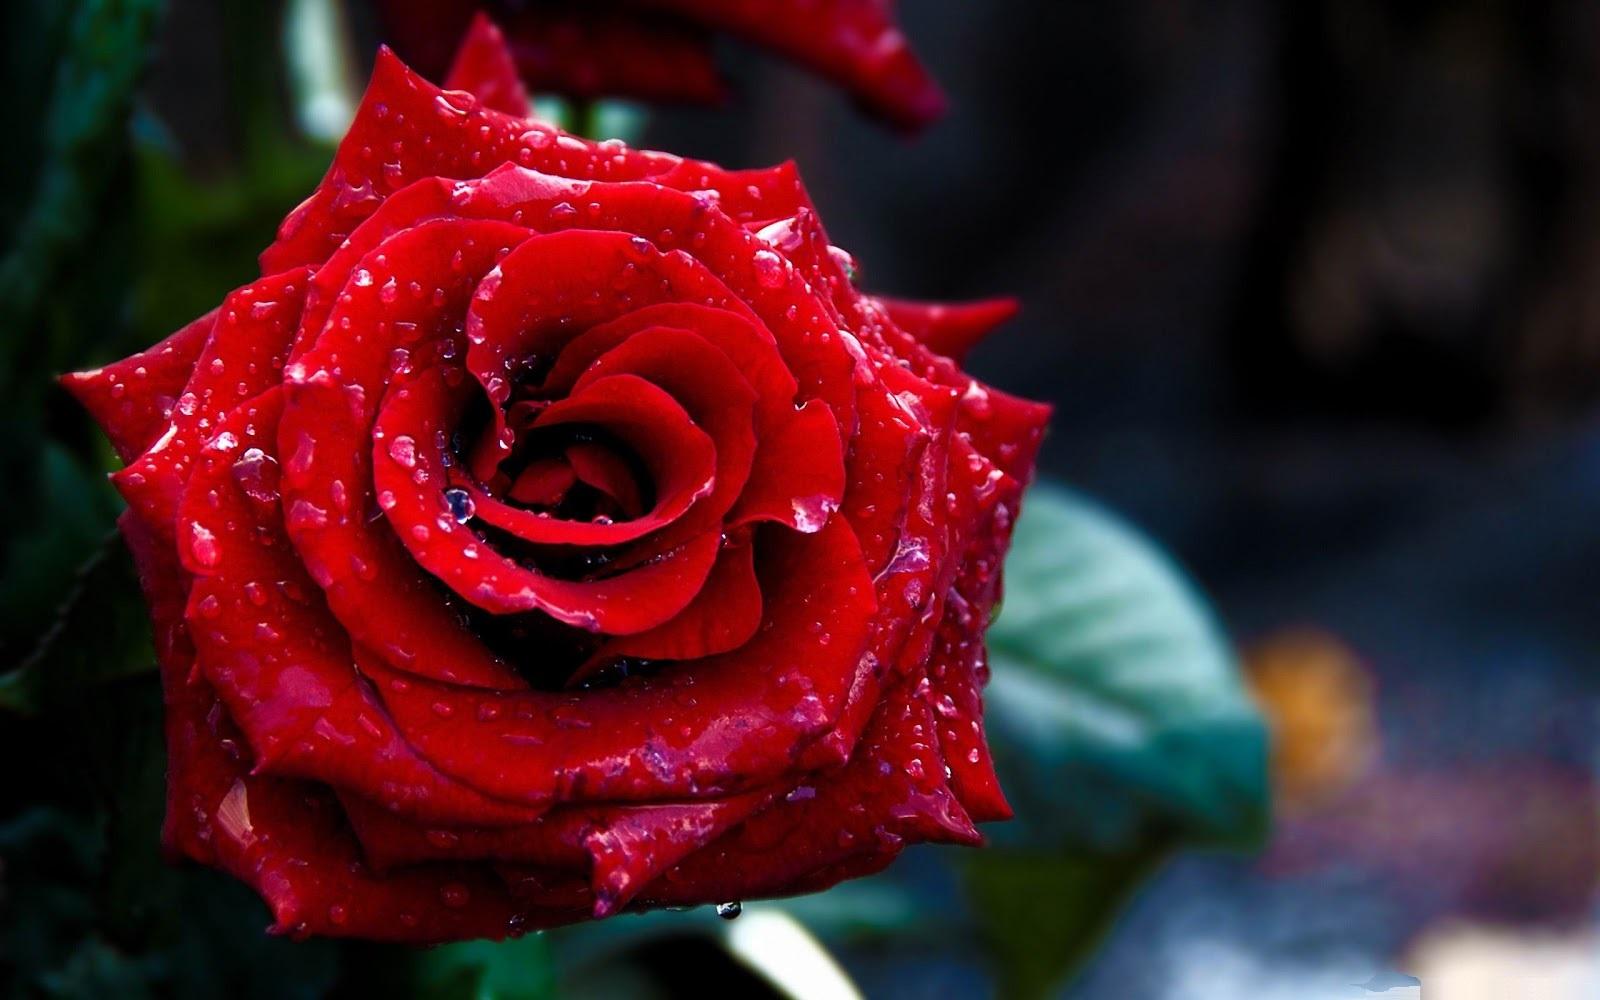 rose day wallpaper download